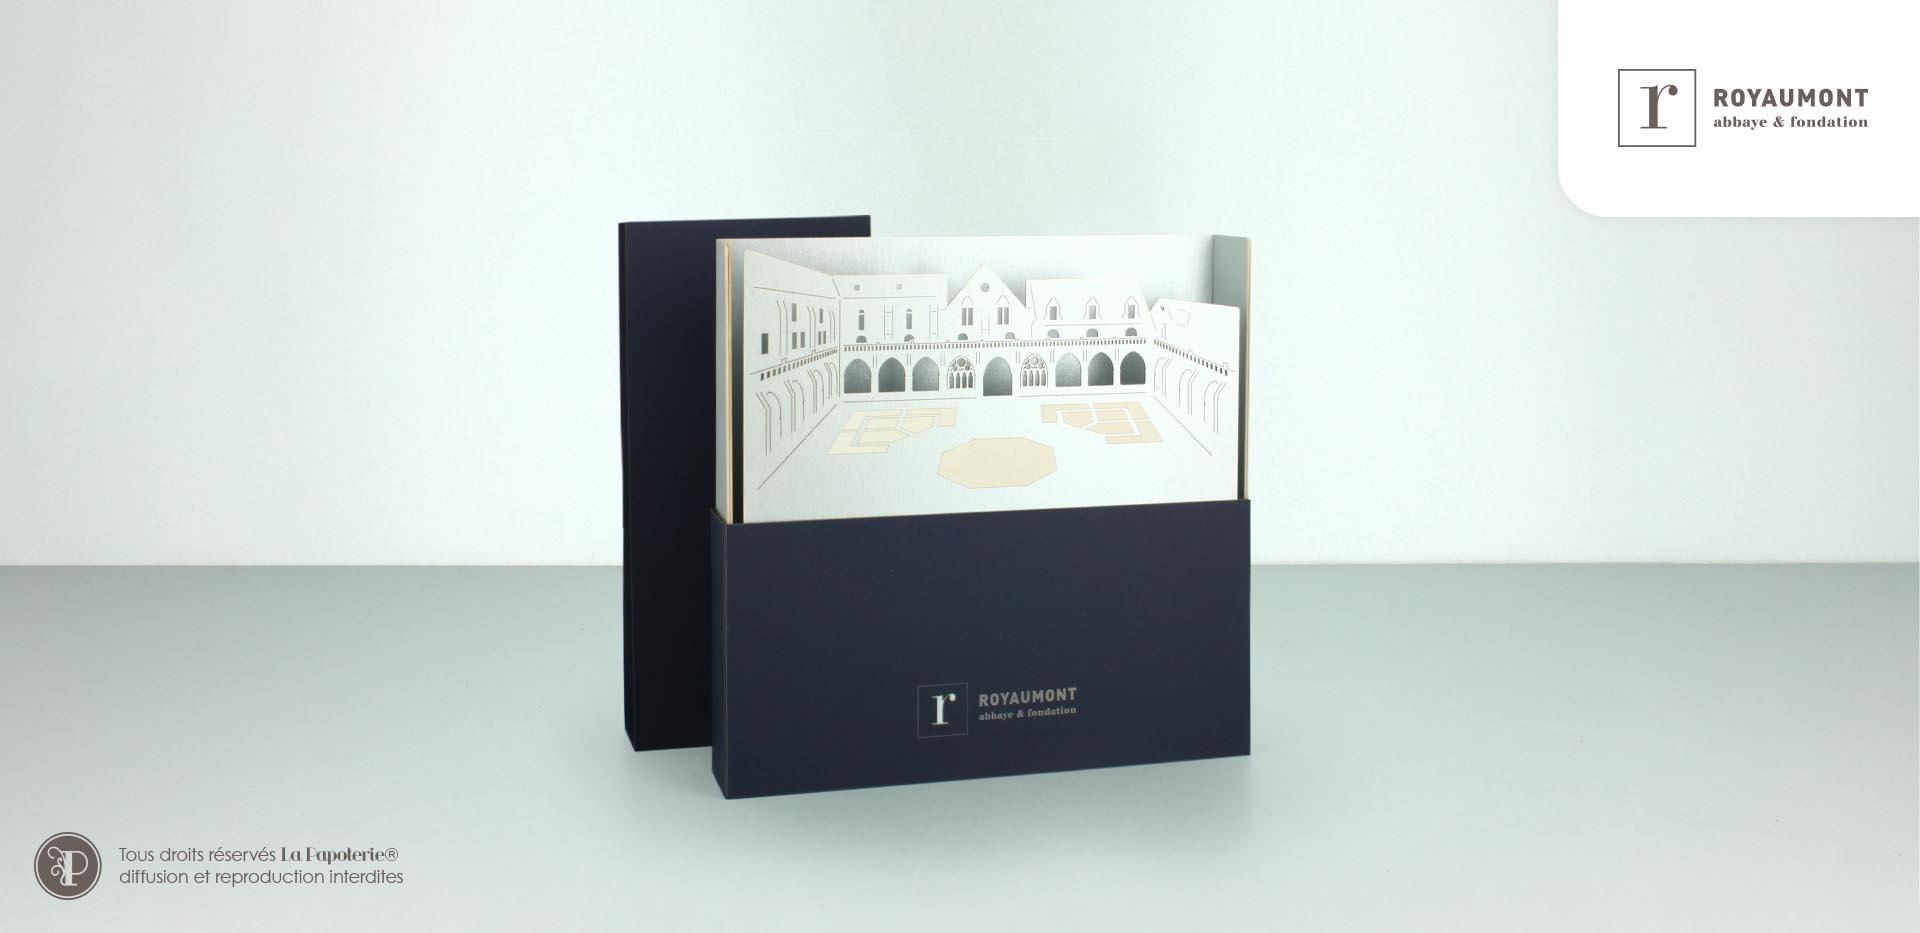 La Papoterie royaumont-coffret-1 Anniversary gift box event Abbaye de Royaumont